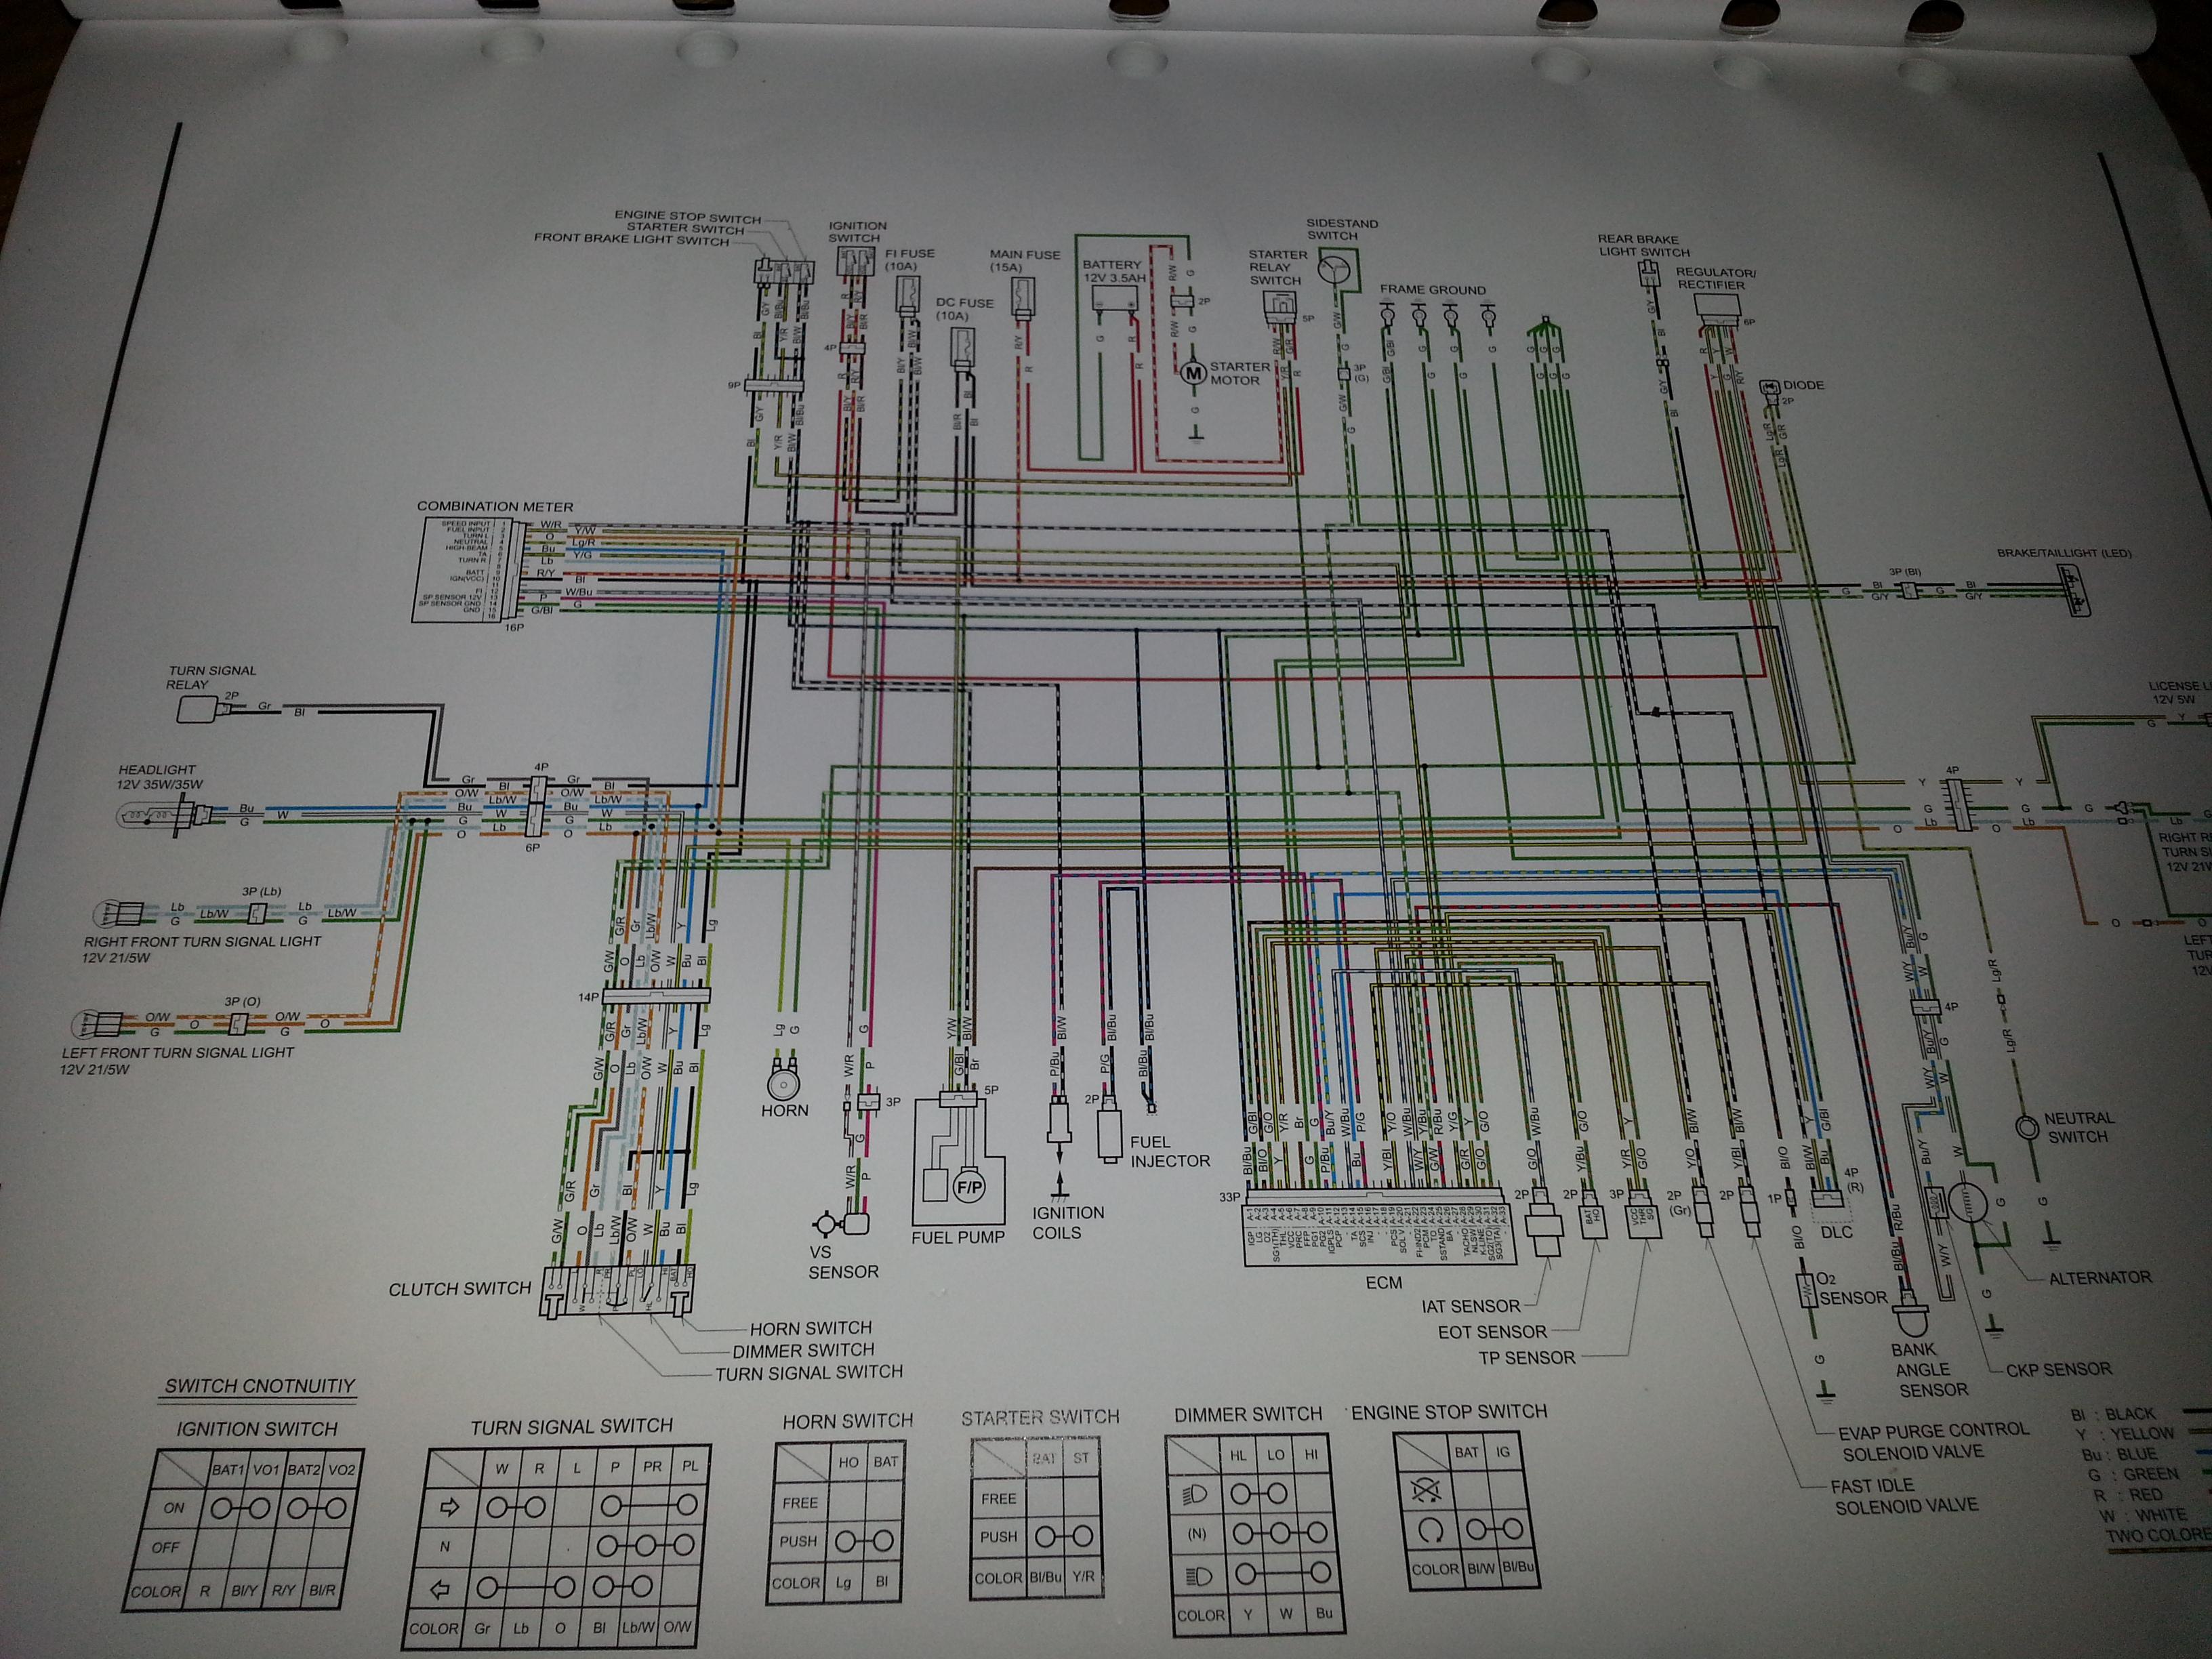 Wiring Diagram Also Omc Boat Wiring Diagram On Wiring Diagram